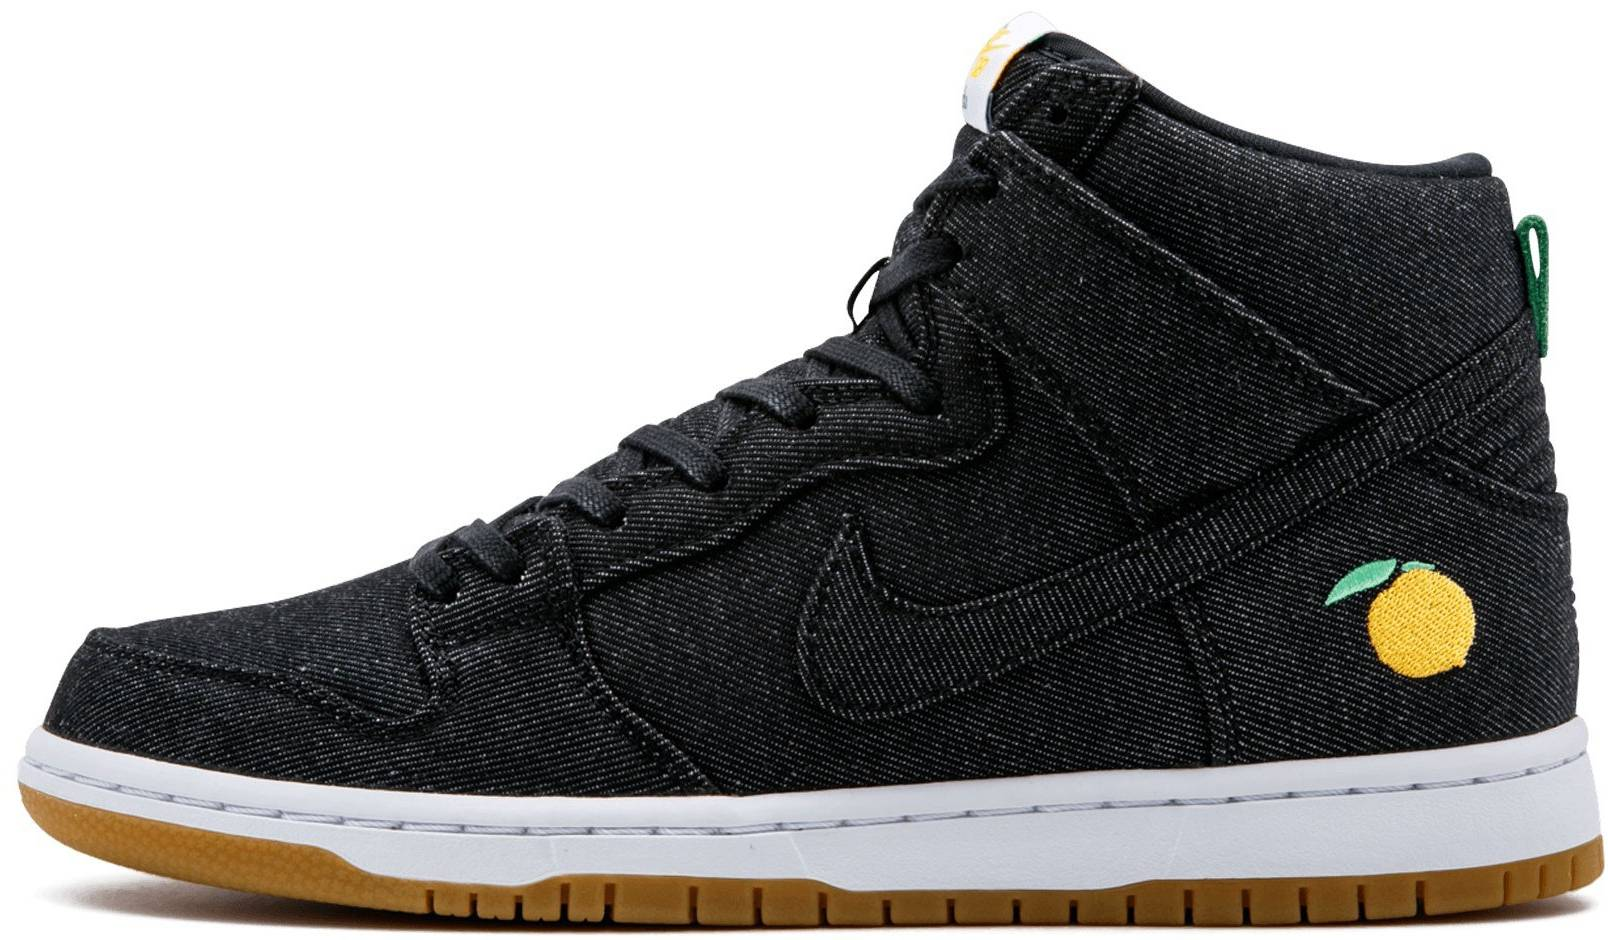 Oclusión tenedor busto  9 Reasons to/NOT to Buy Nike SB Dunk High Pro Momofuku (Feb 2021) |  RunRepeat